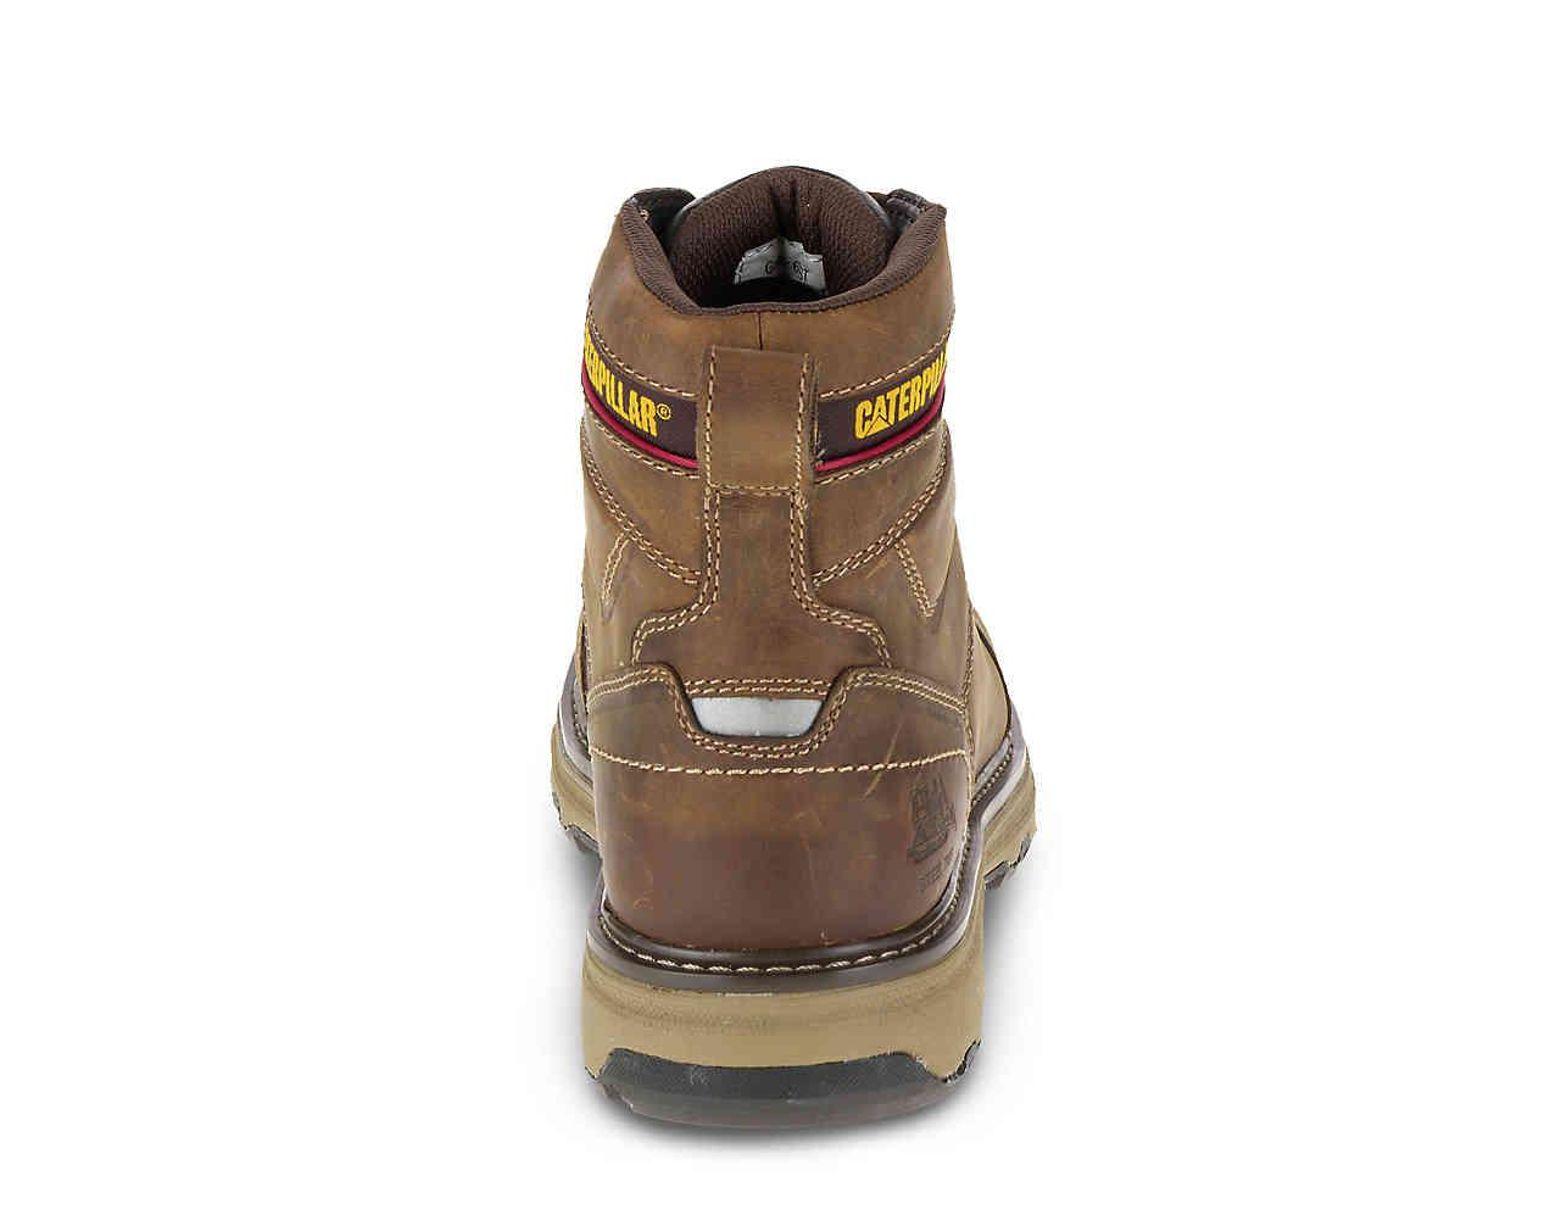 5820f7f1ea6 Lyst - Caterpillar Granger Steel Toe Work Boot in Brown for Men